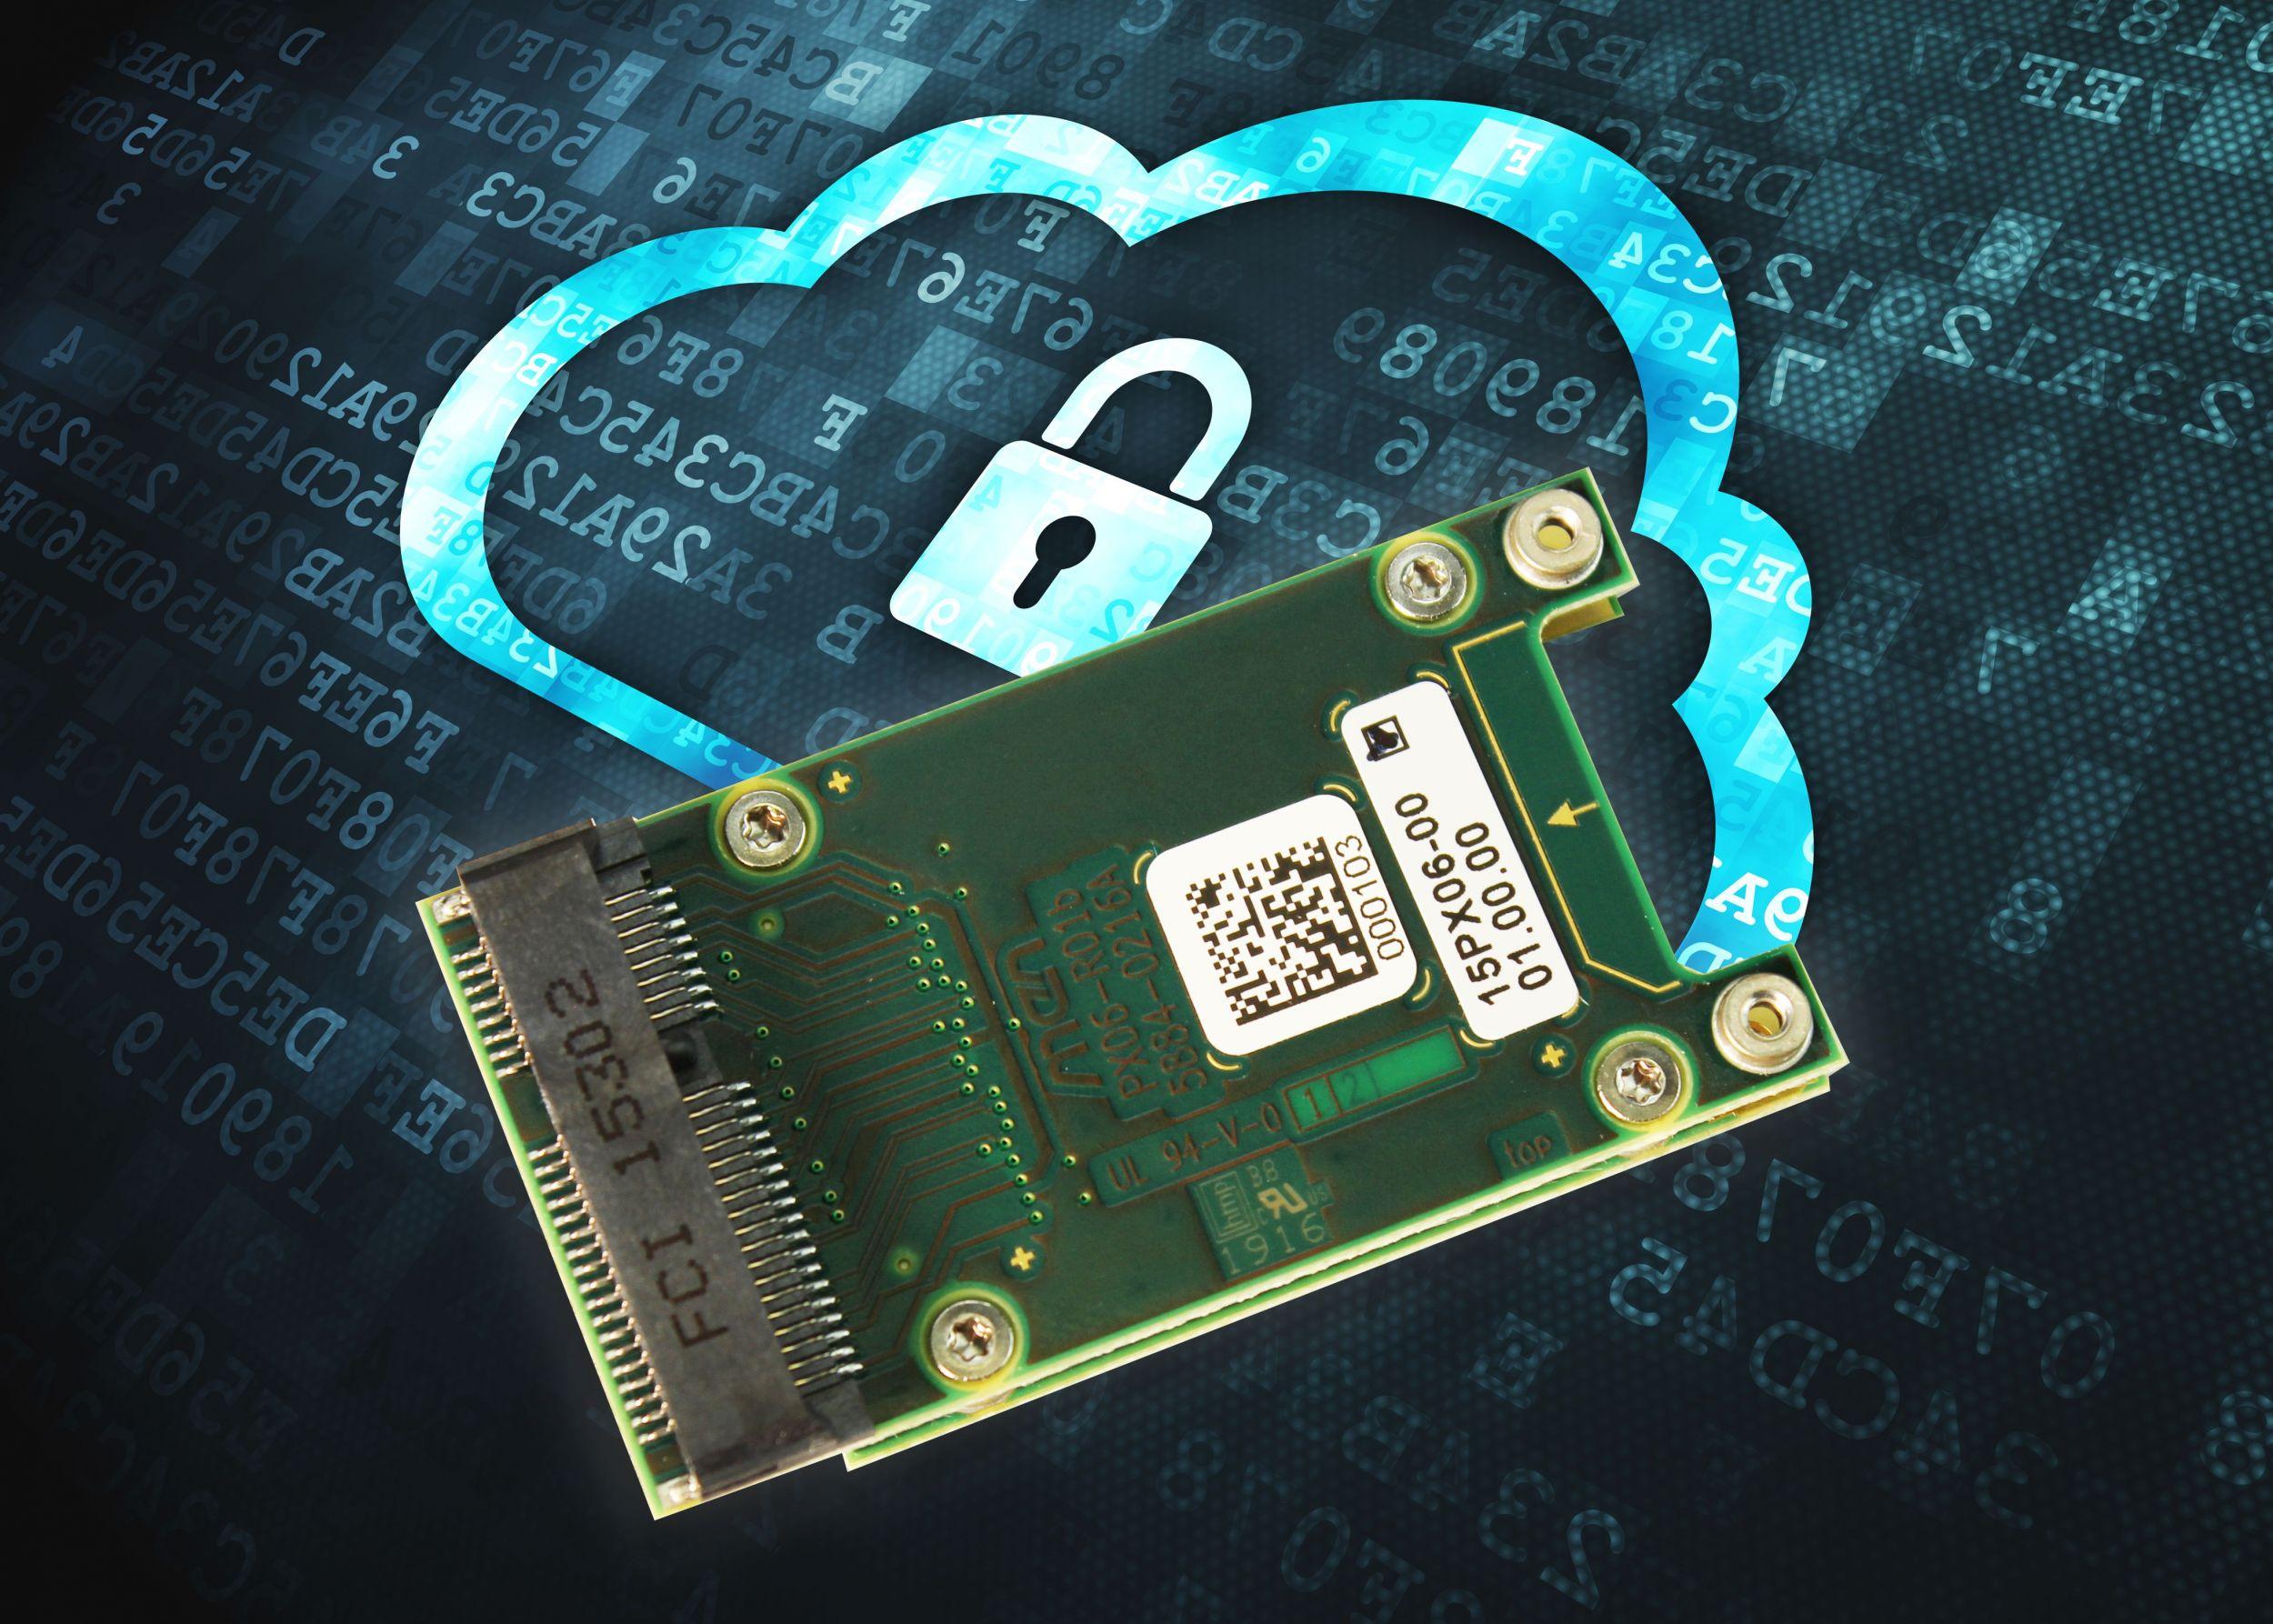 Sicher in die Cloud: PCI-Express-Mini-Card mit Smart-Card-Schnittstelle